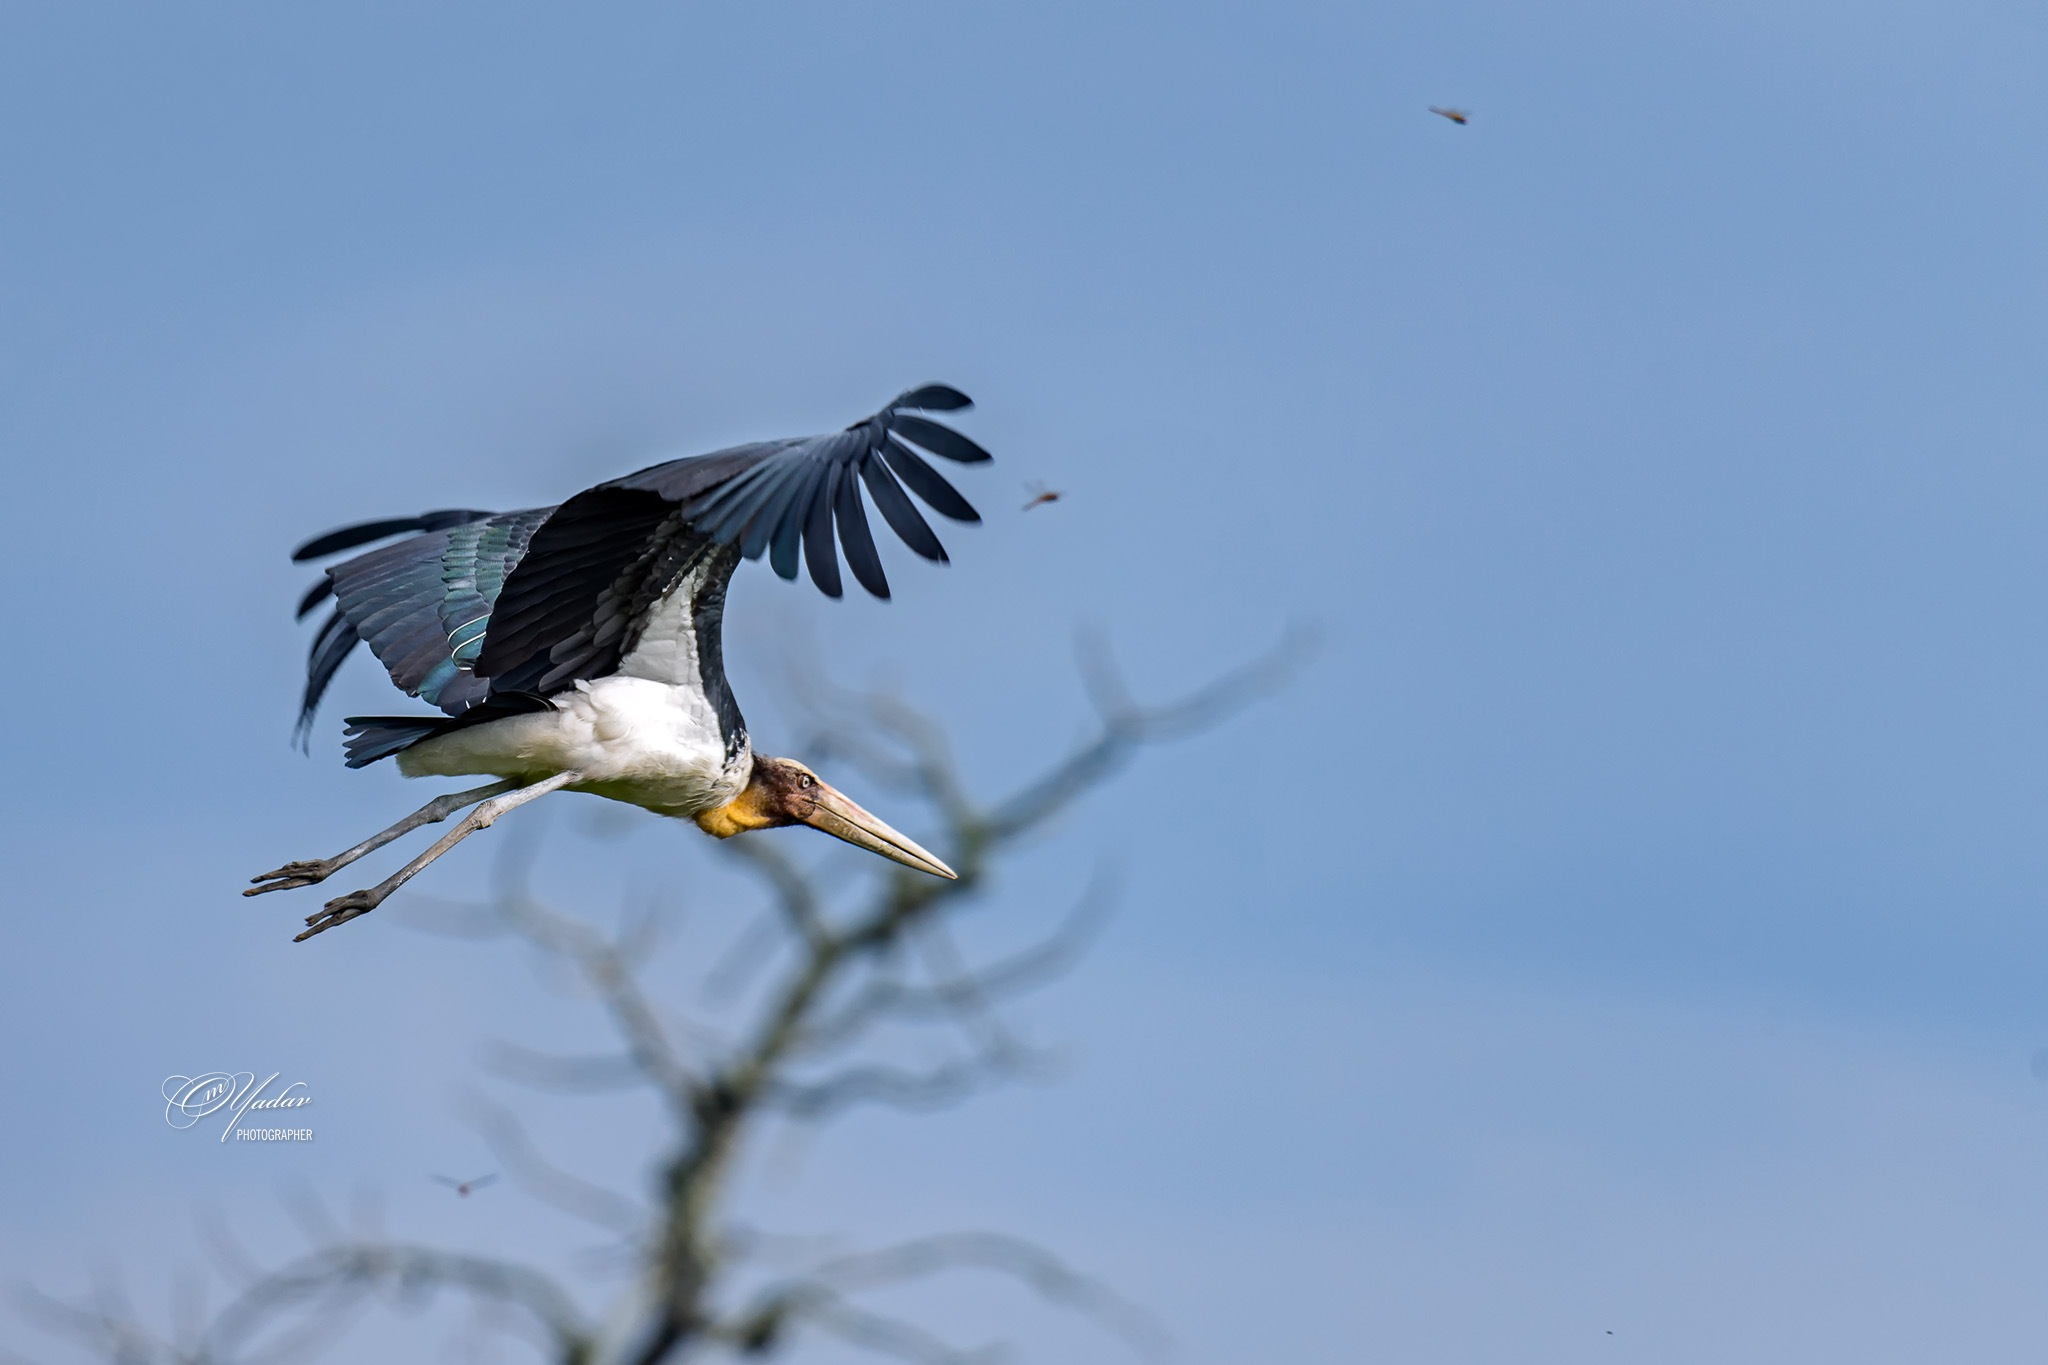 Lesser Adjutant Stork in flight by Om Yadav